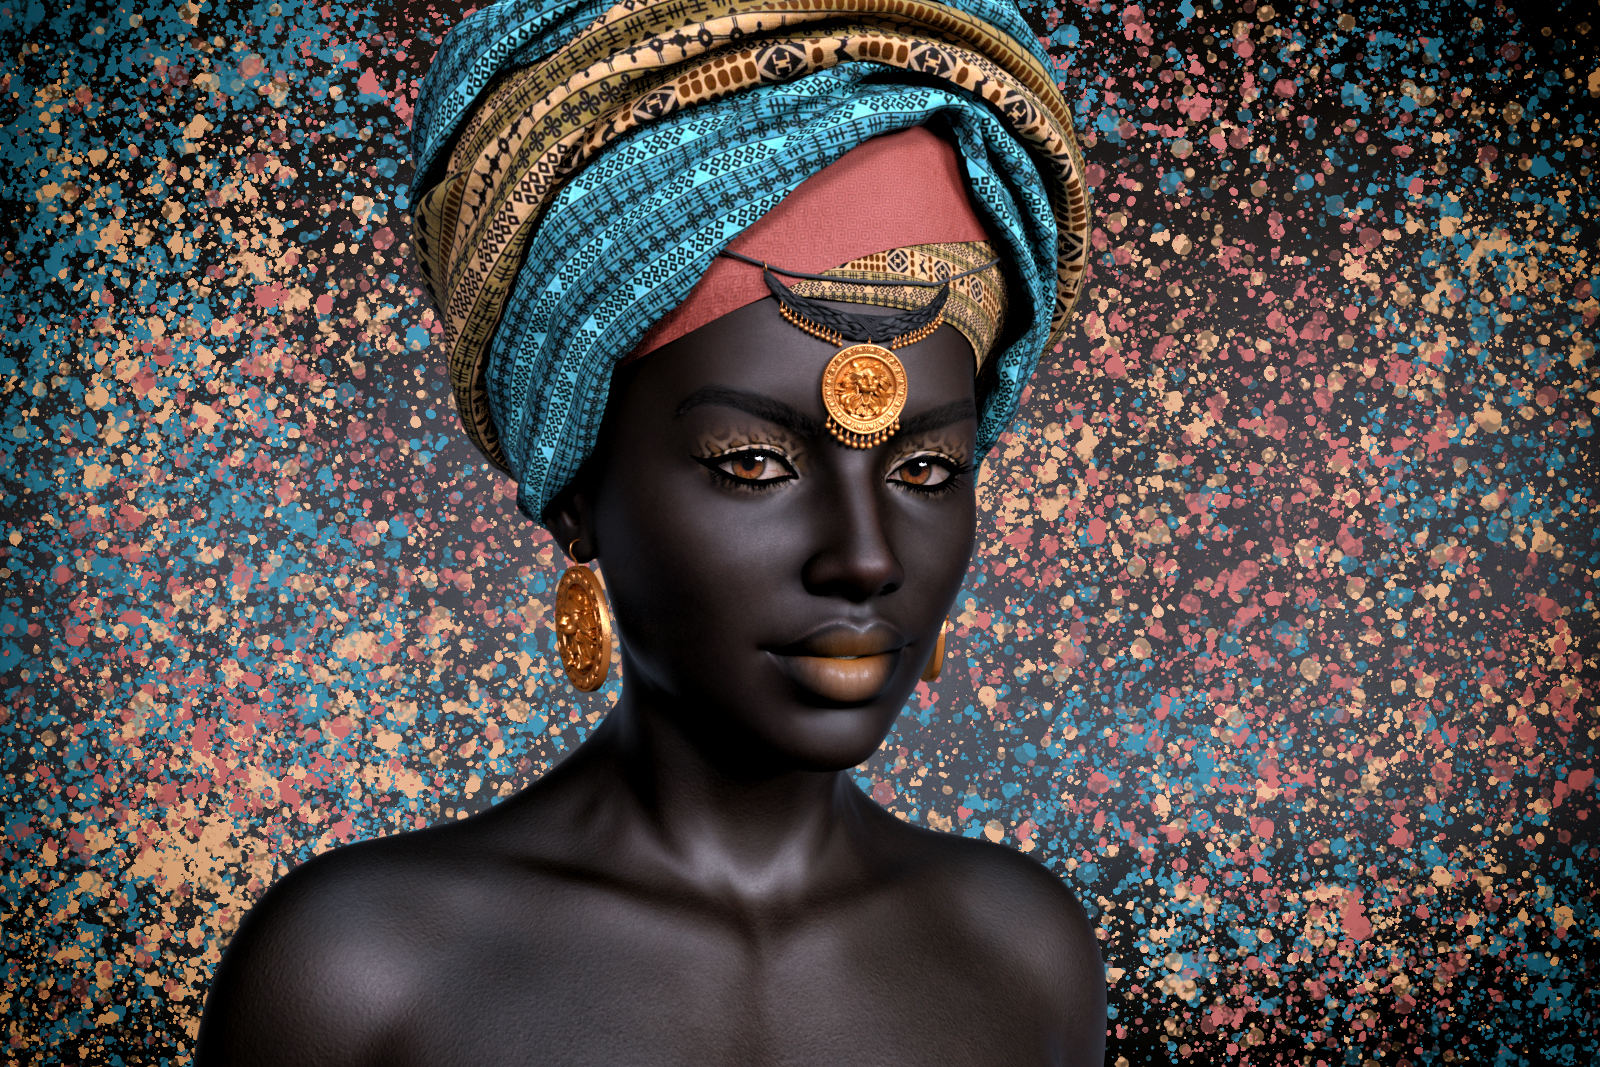 Portrait Gallery (Digital Art)